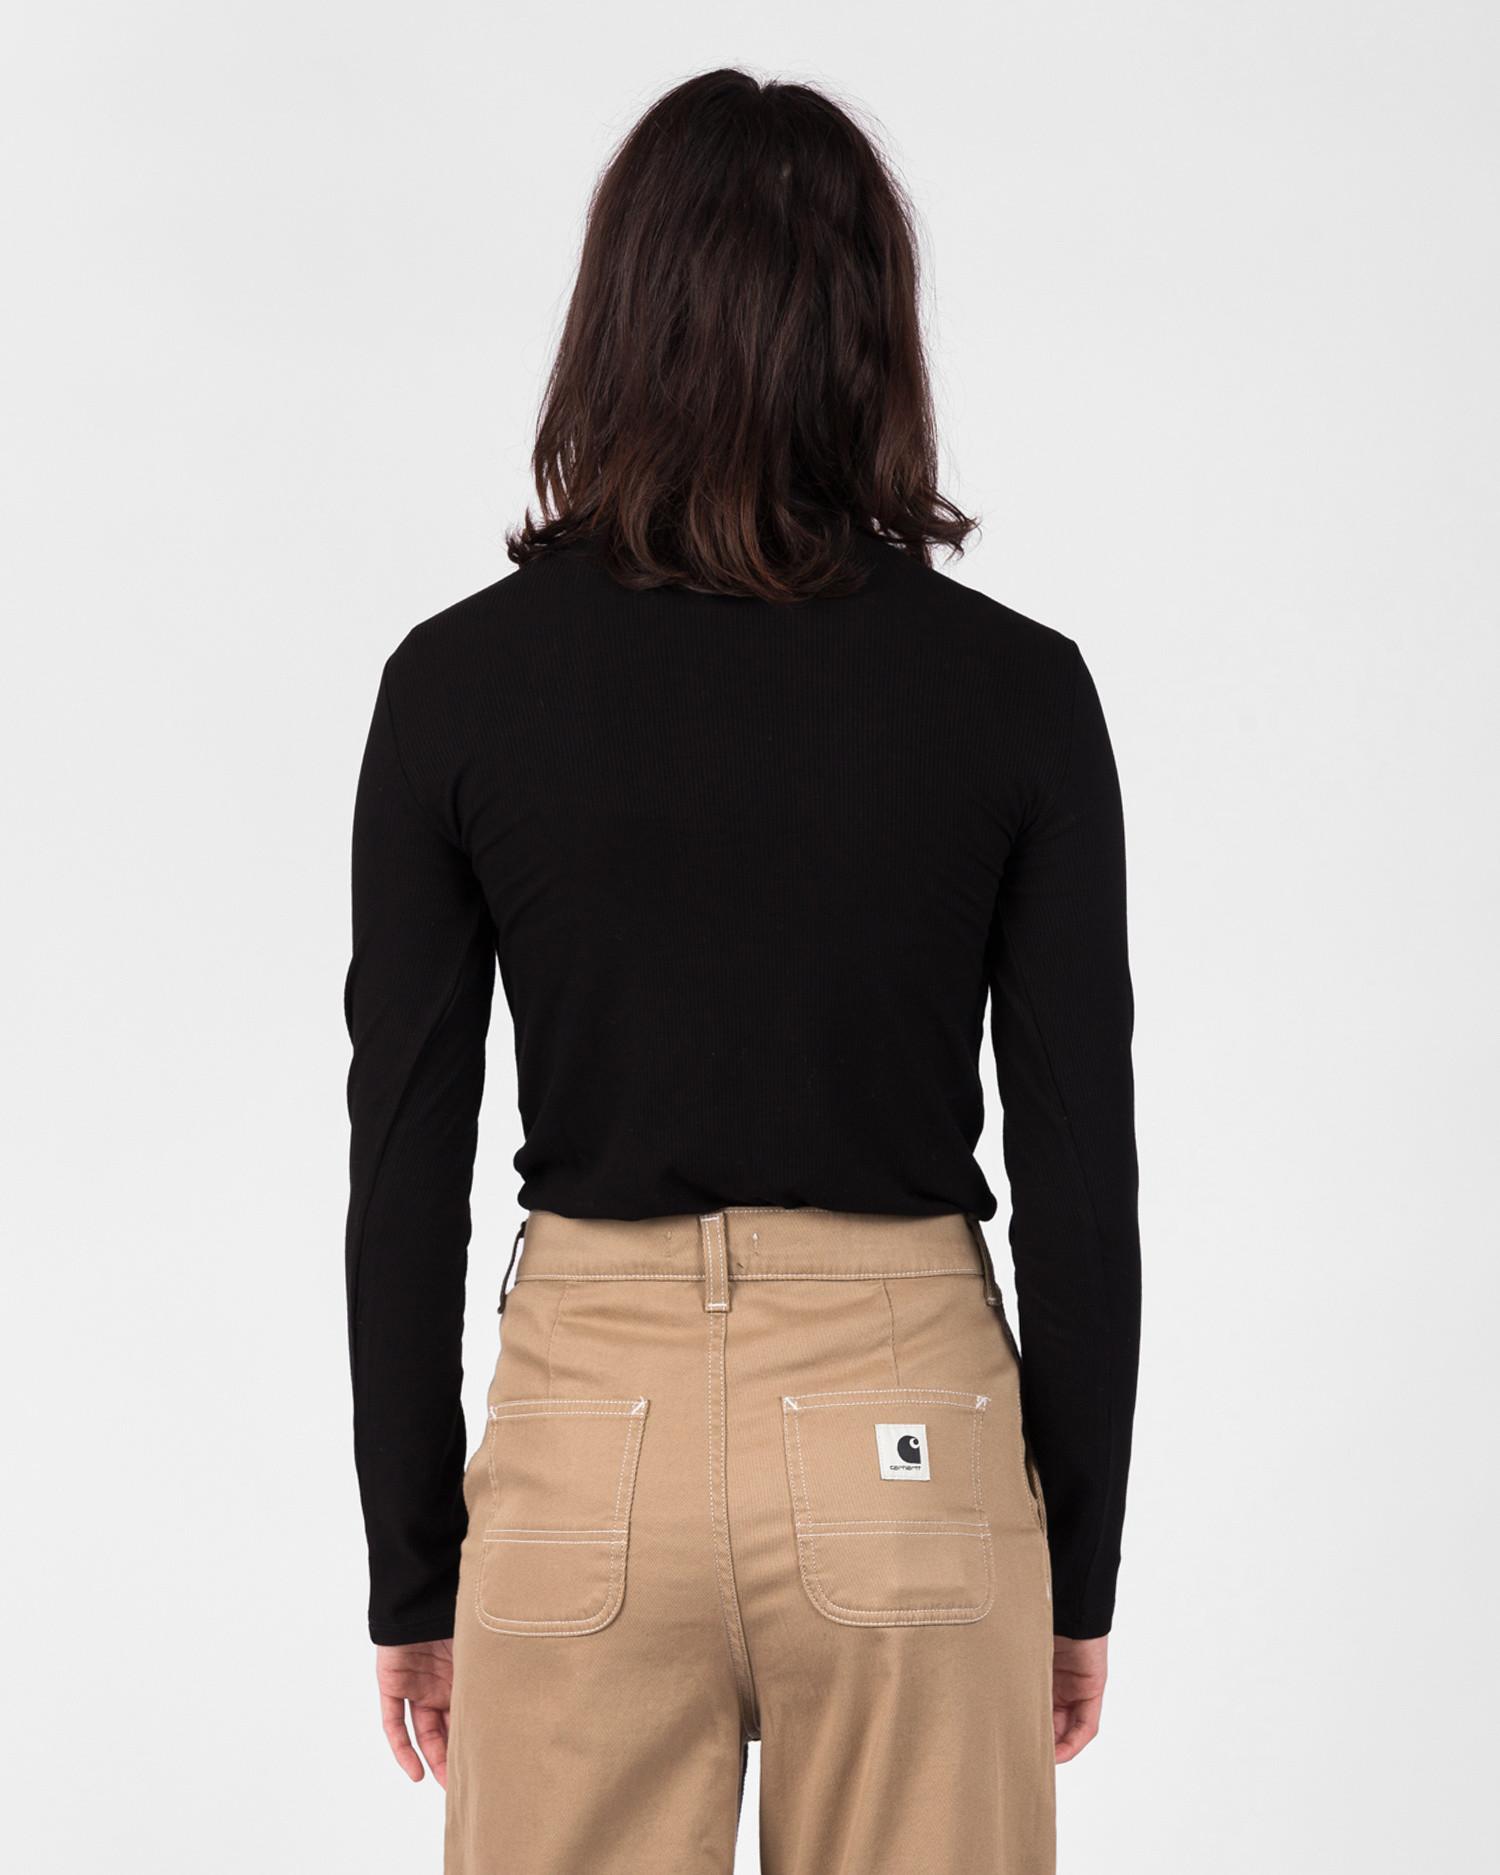 Carhartt W' Longsleeve Seri T-shirt Elastance Black